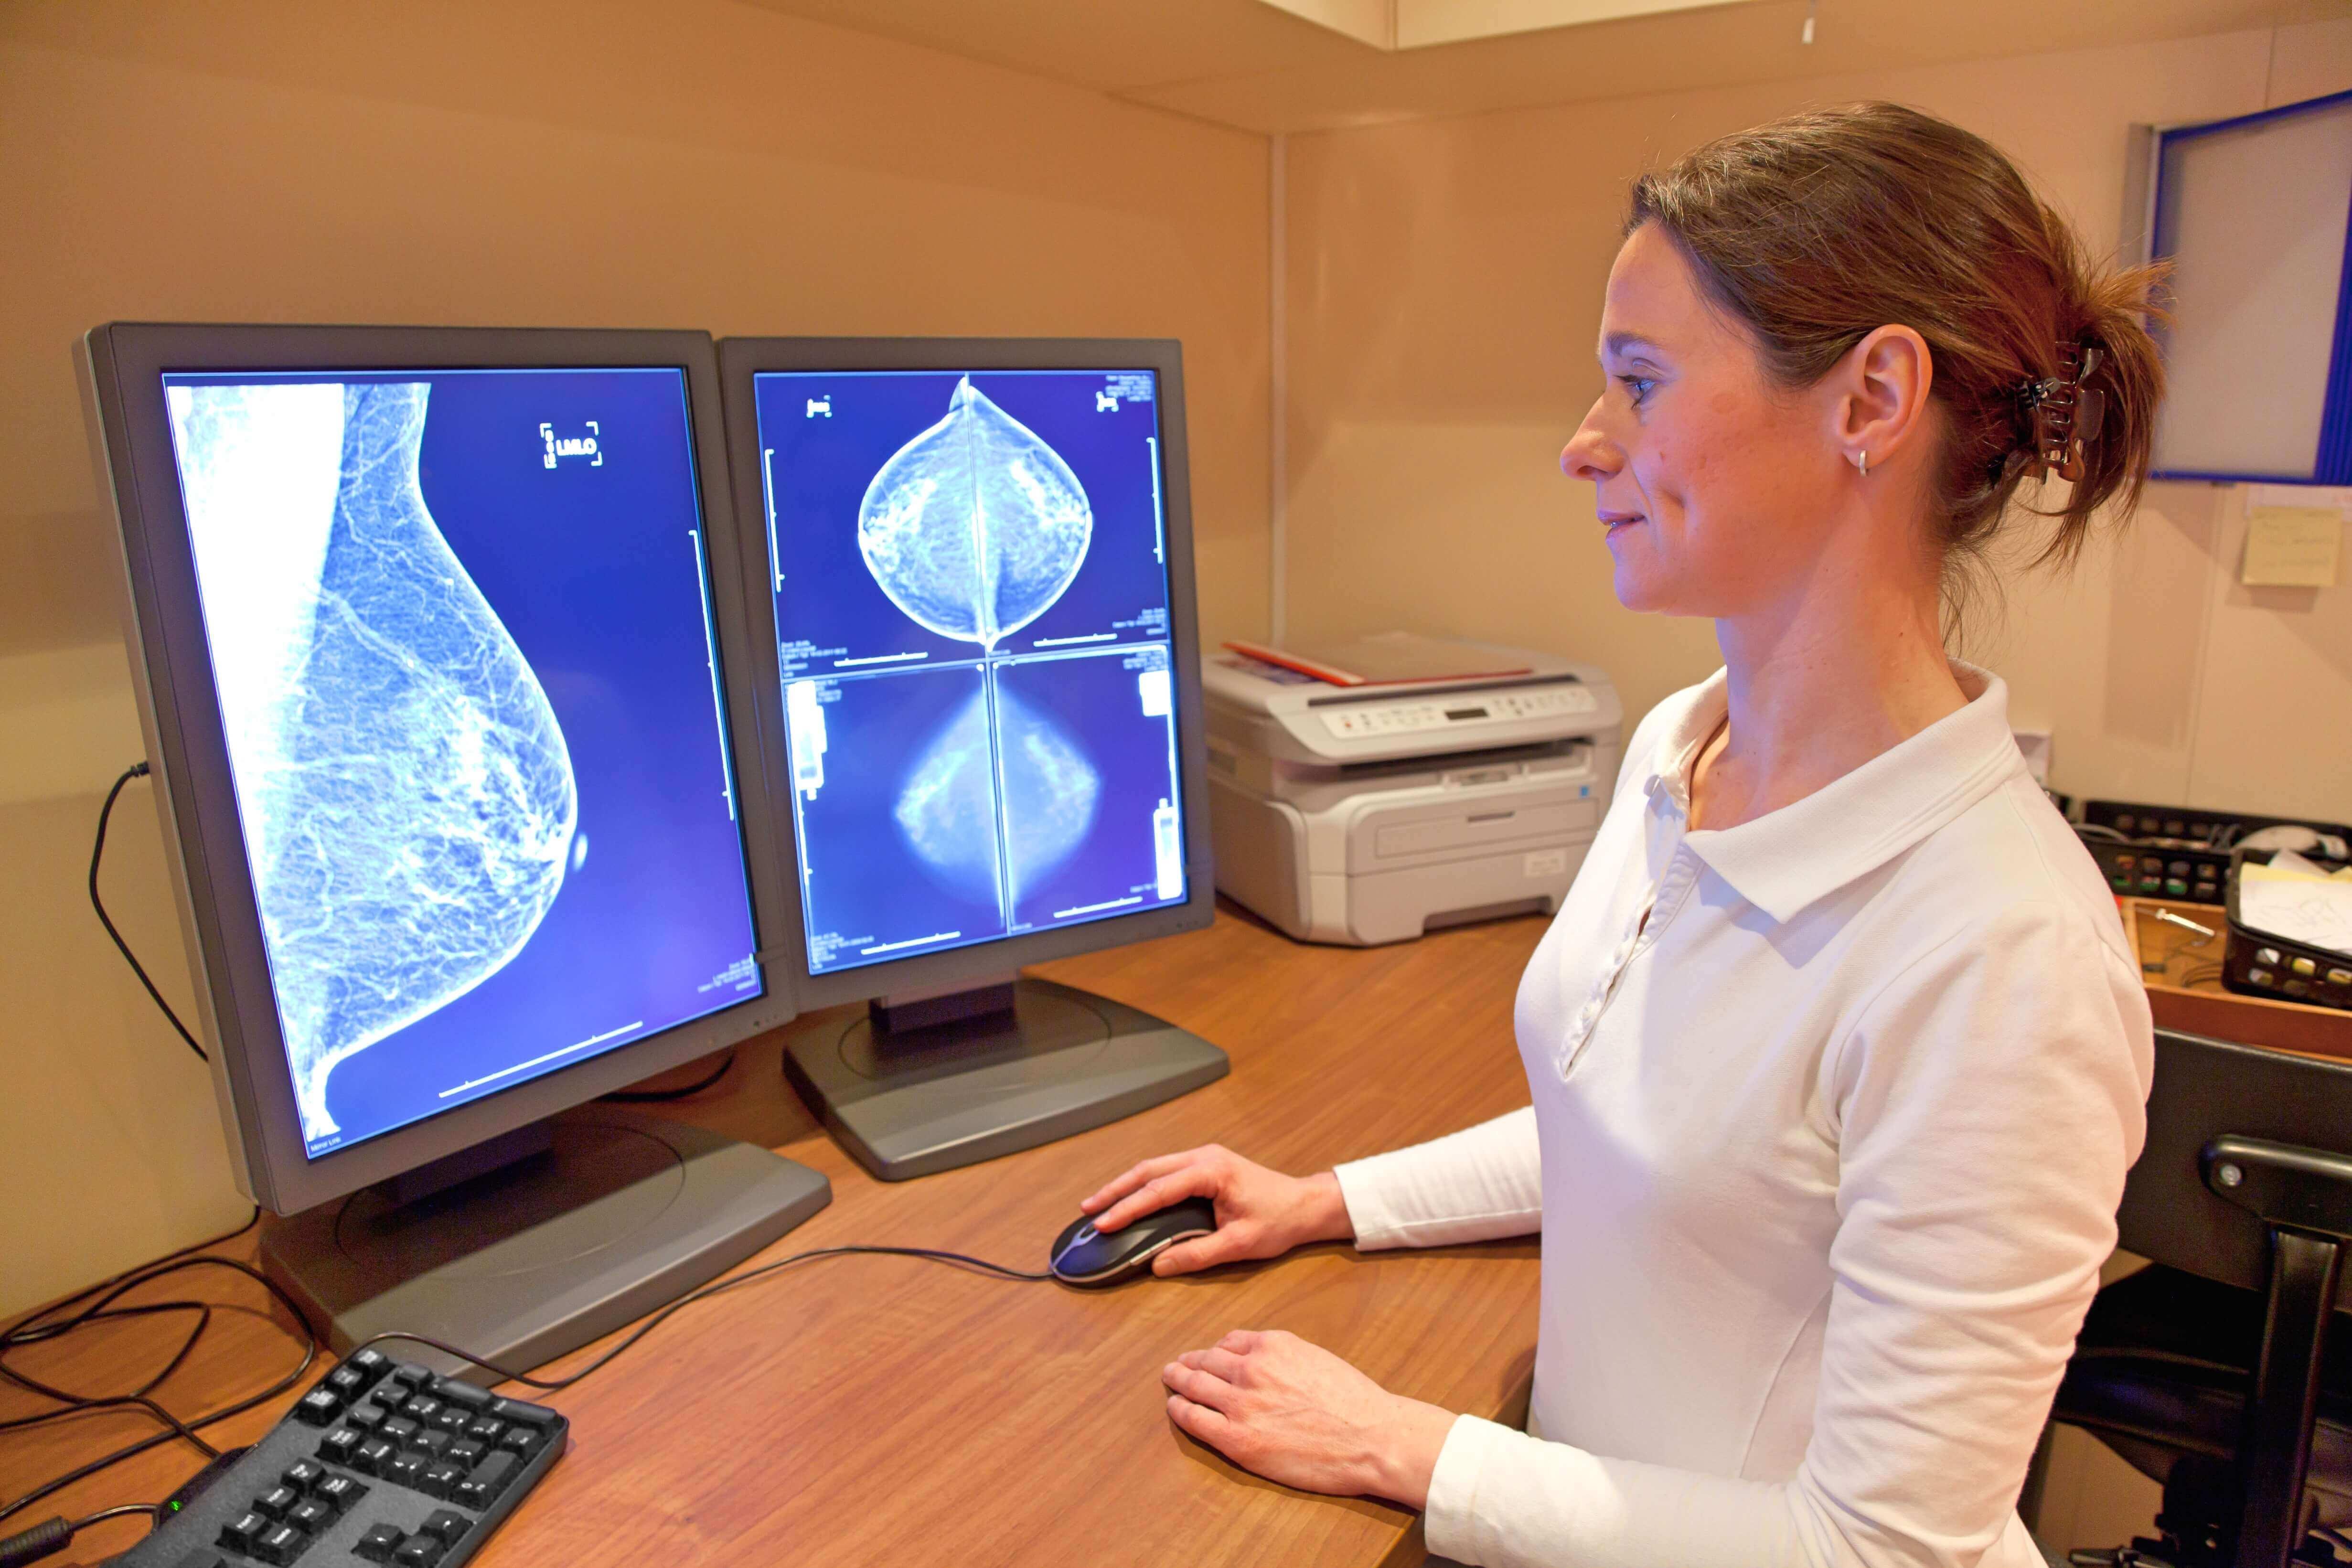 Лечение рака за границей: германия или израиль?